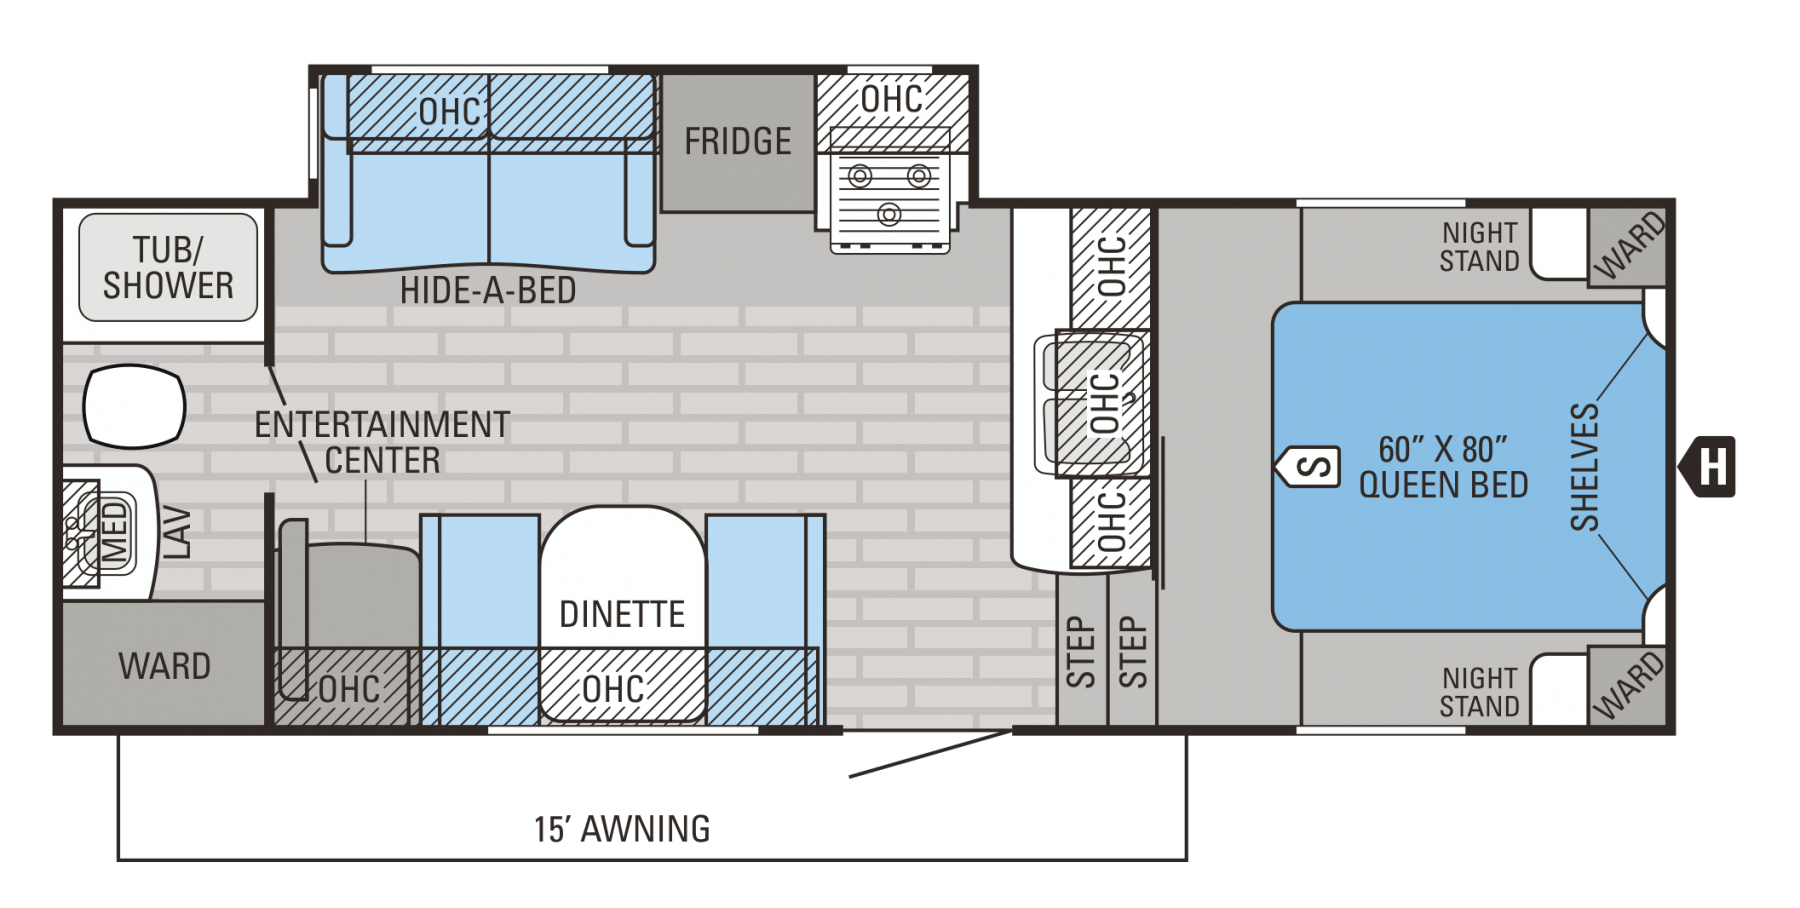 2001 Jayco Eagle Wiring Diagram Samsung Electric Dryer Alpenlite 5th Wheel Floor Plans Flooring Ideas And